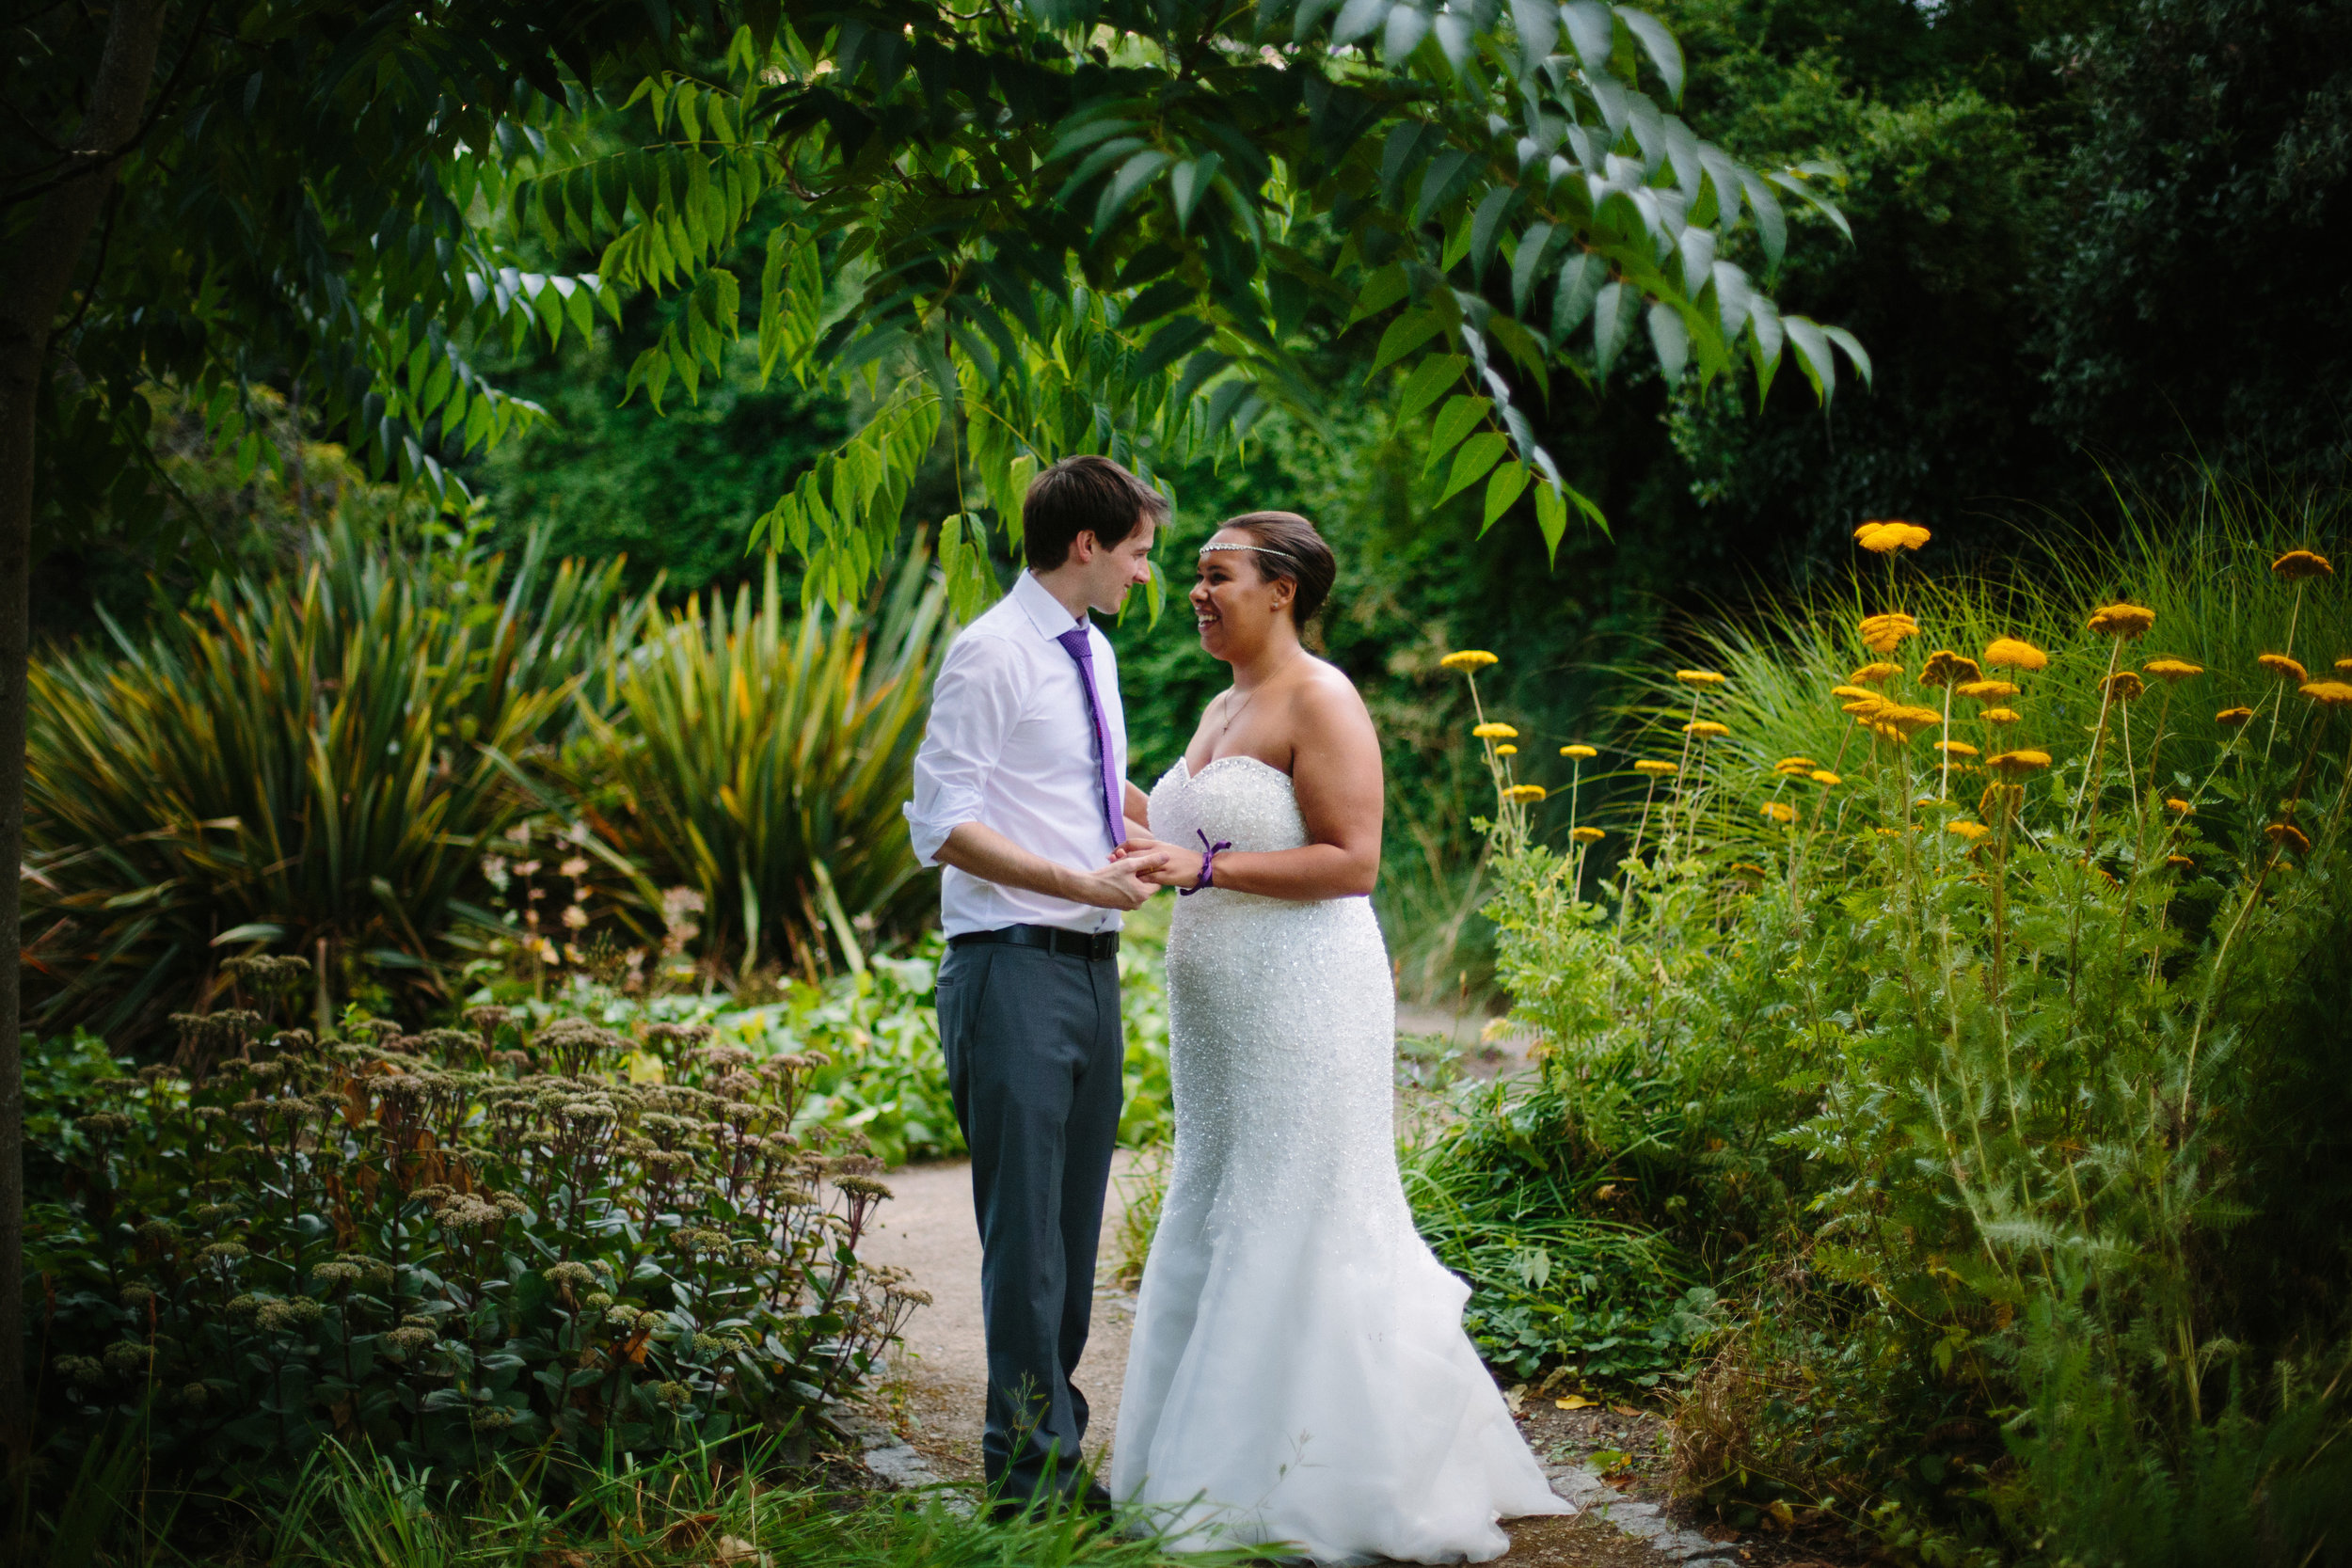 greenwich-charlton-house-london-wedding-bridal-portrait-382